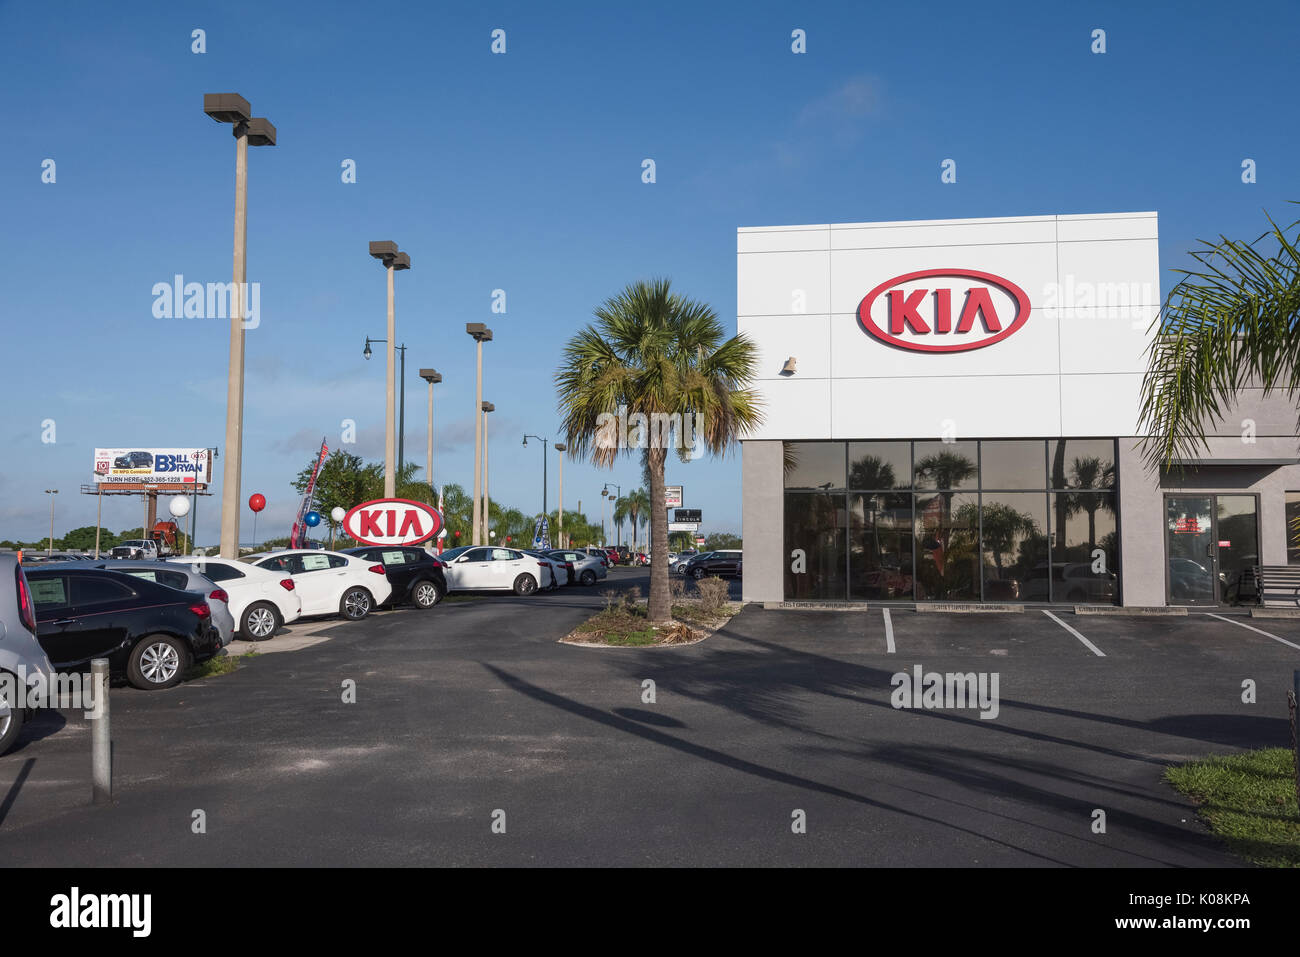 Kia Dealership Stock Photos Amp Kia Dealership Stock Images